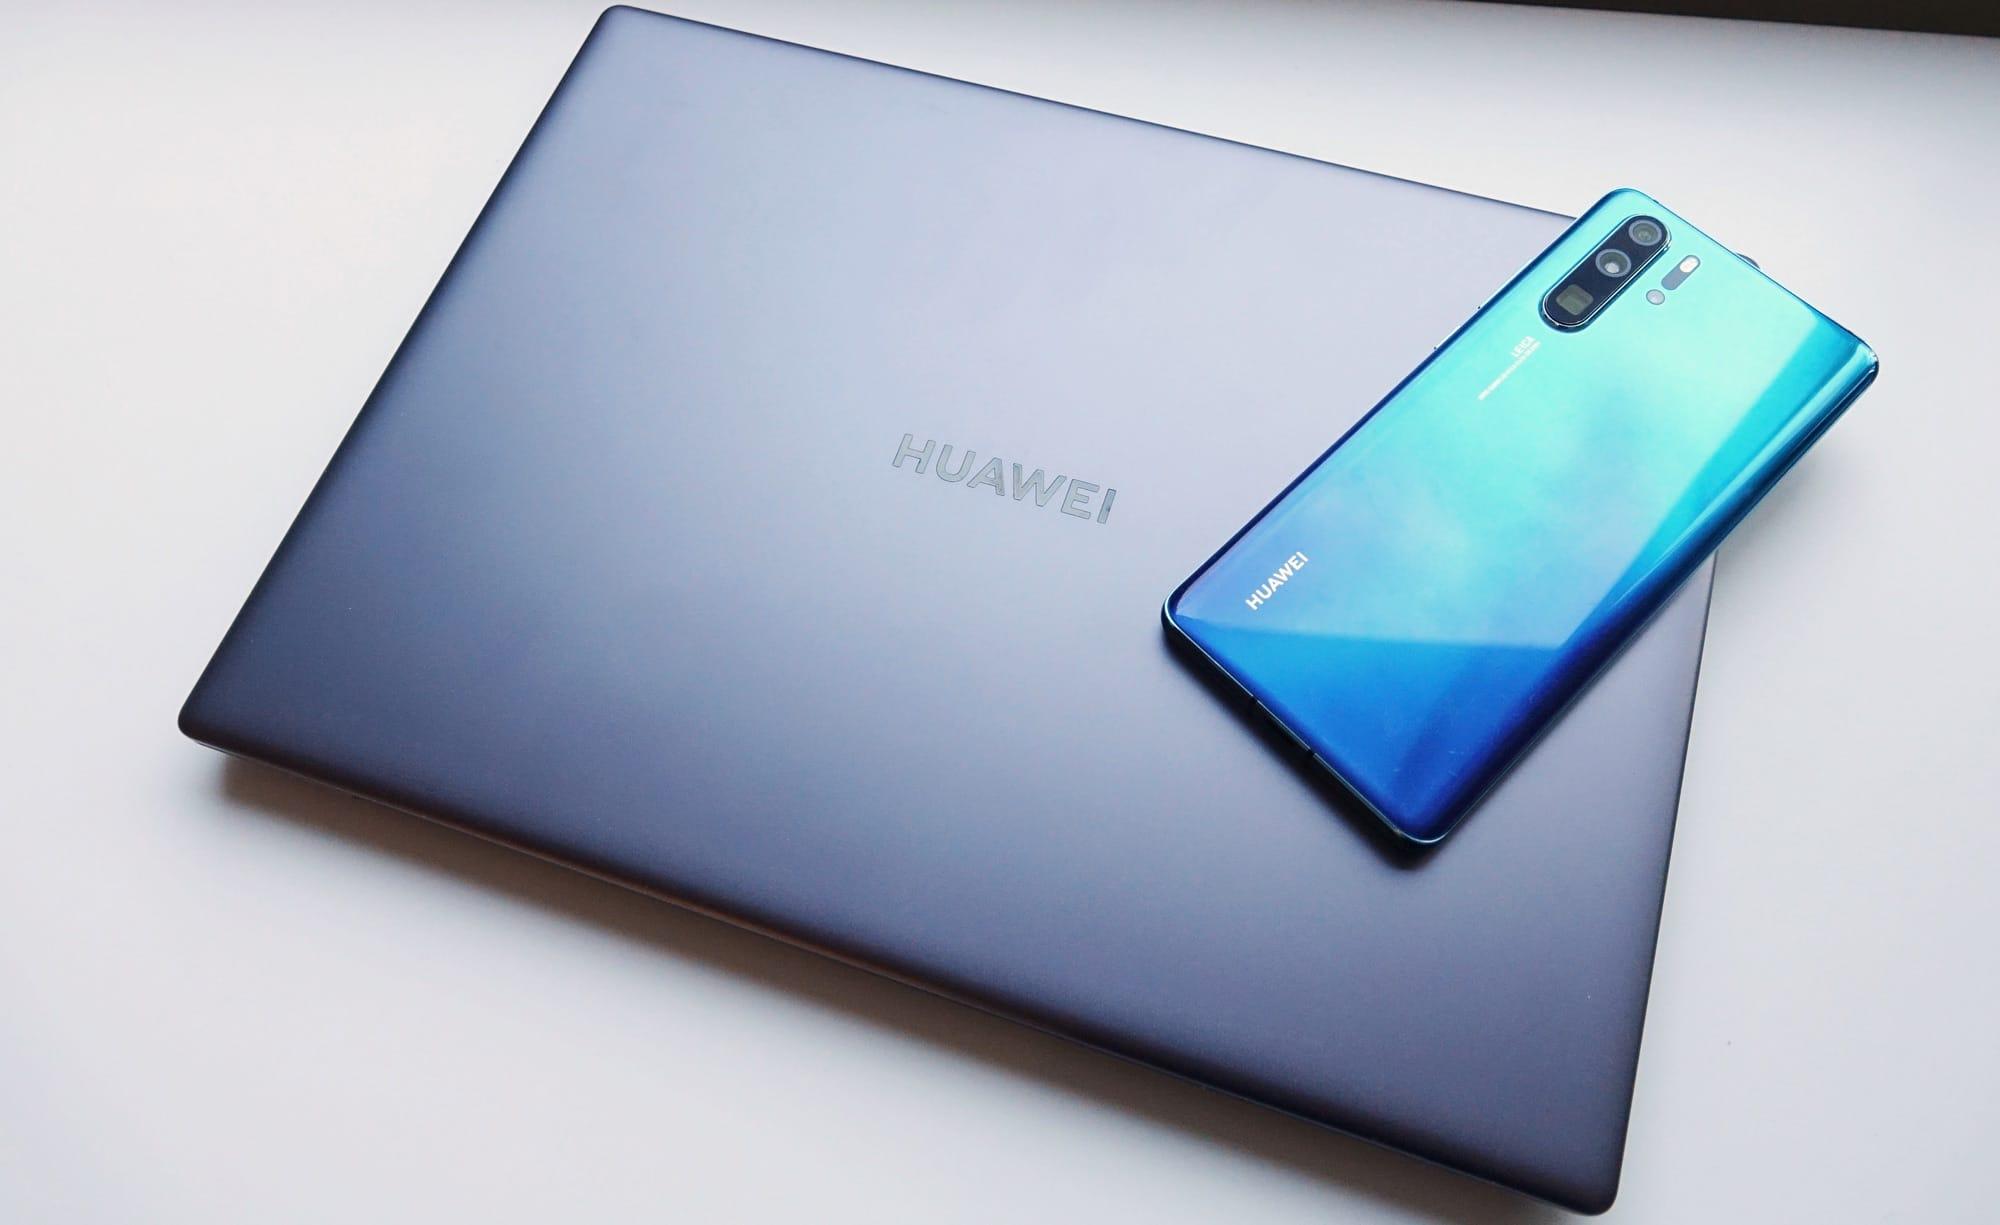 Huawei MateBook X Pro reviewed